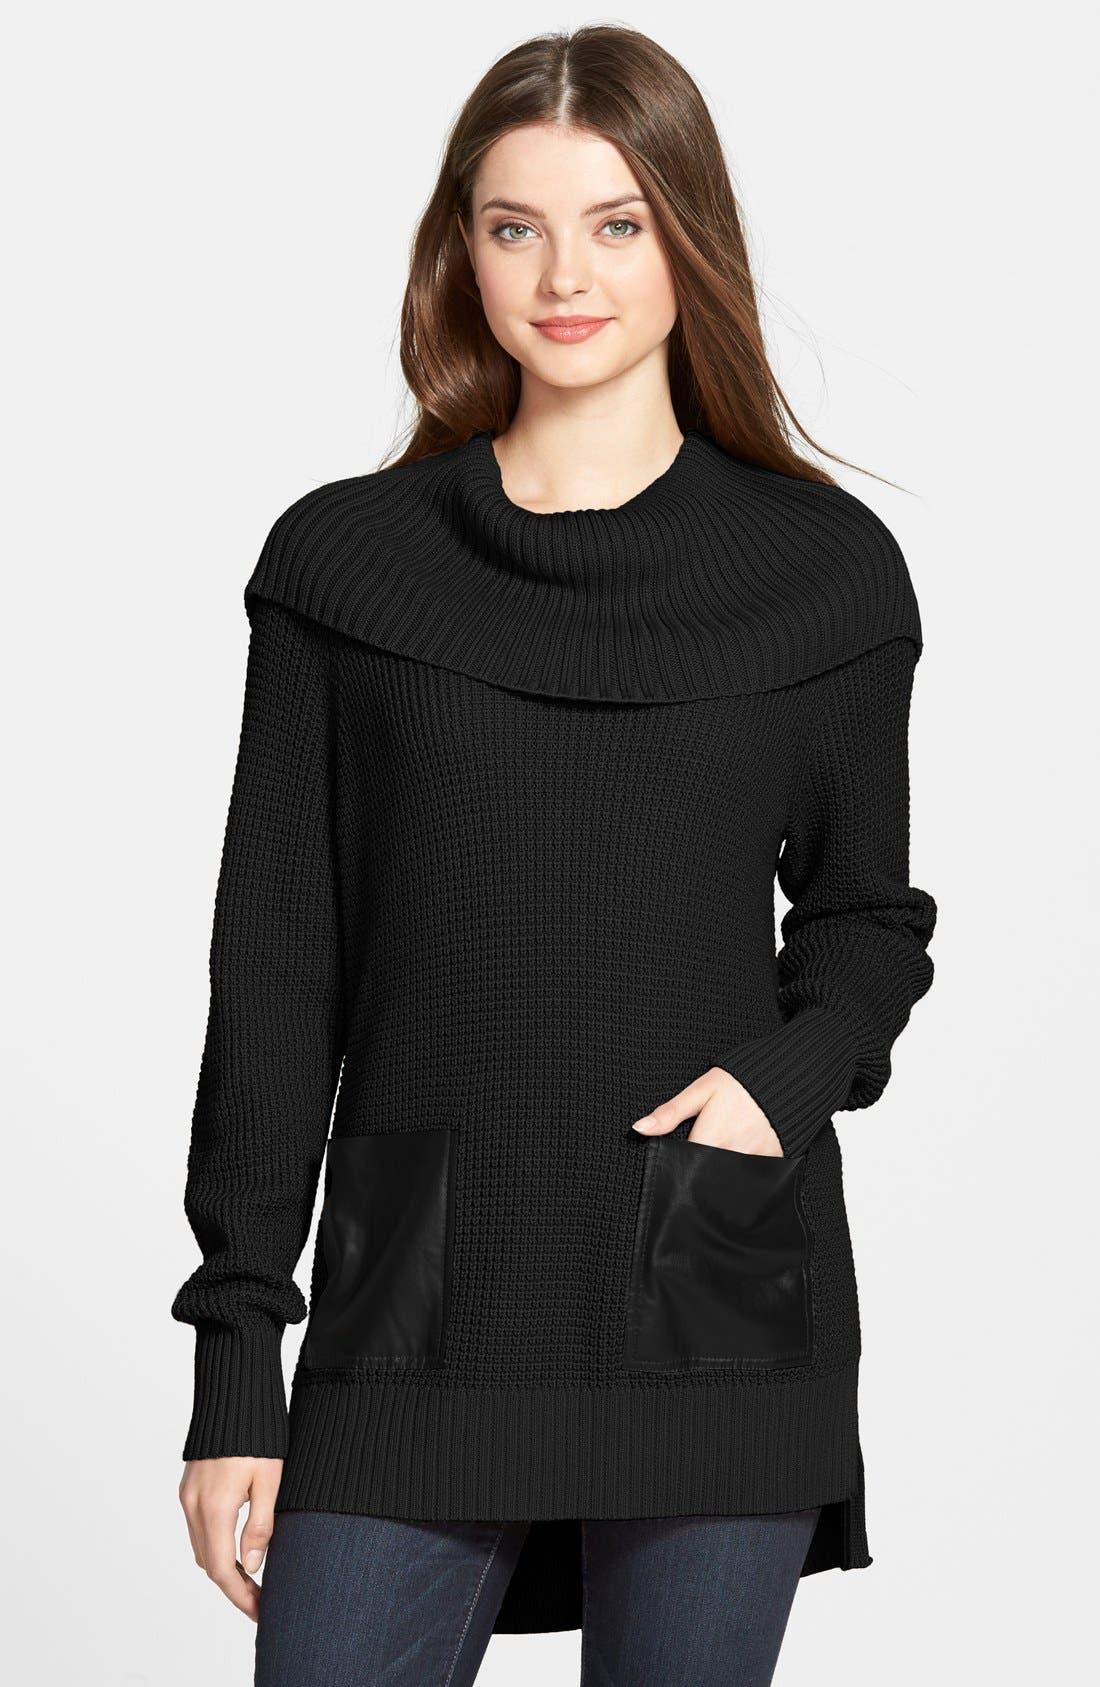 MICHAEL MICHAEL KORS,                             Faux Leather Pocket Cowl Neck Sweater,                             Main thumbnail 1, color,                             001